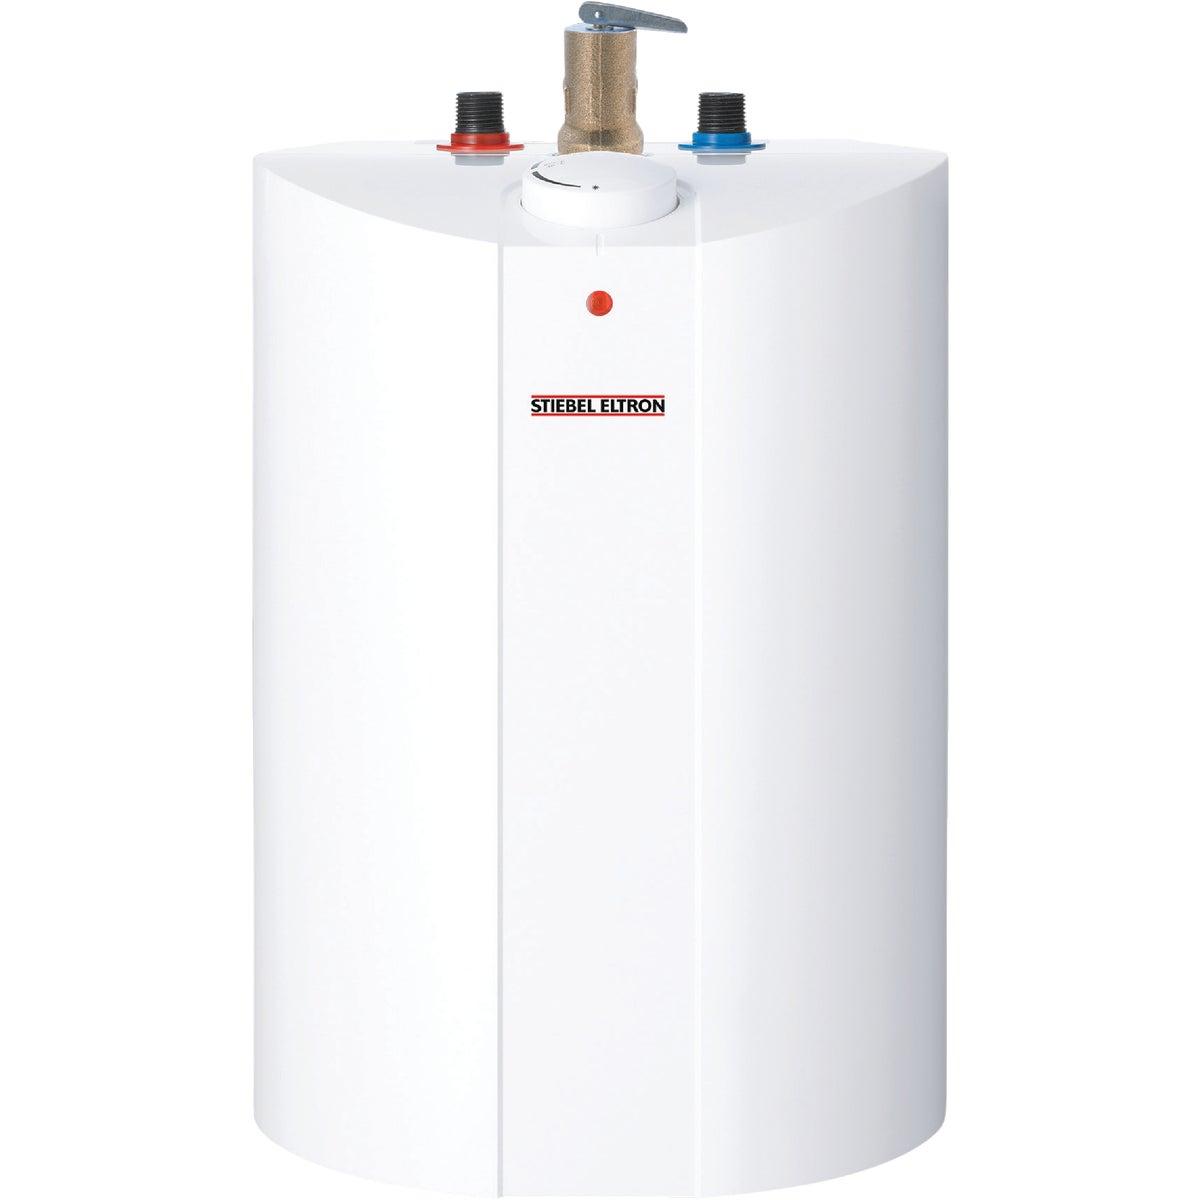 4GAL WATER HEATER - GL4.0 by Bosch Water Heating